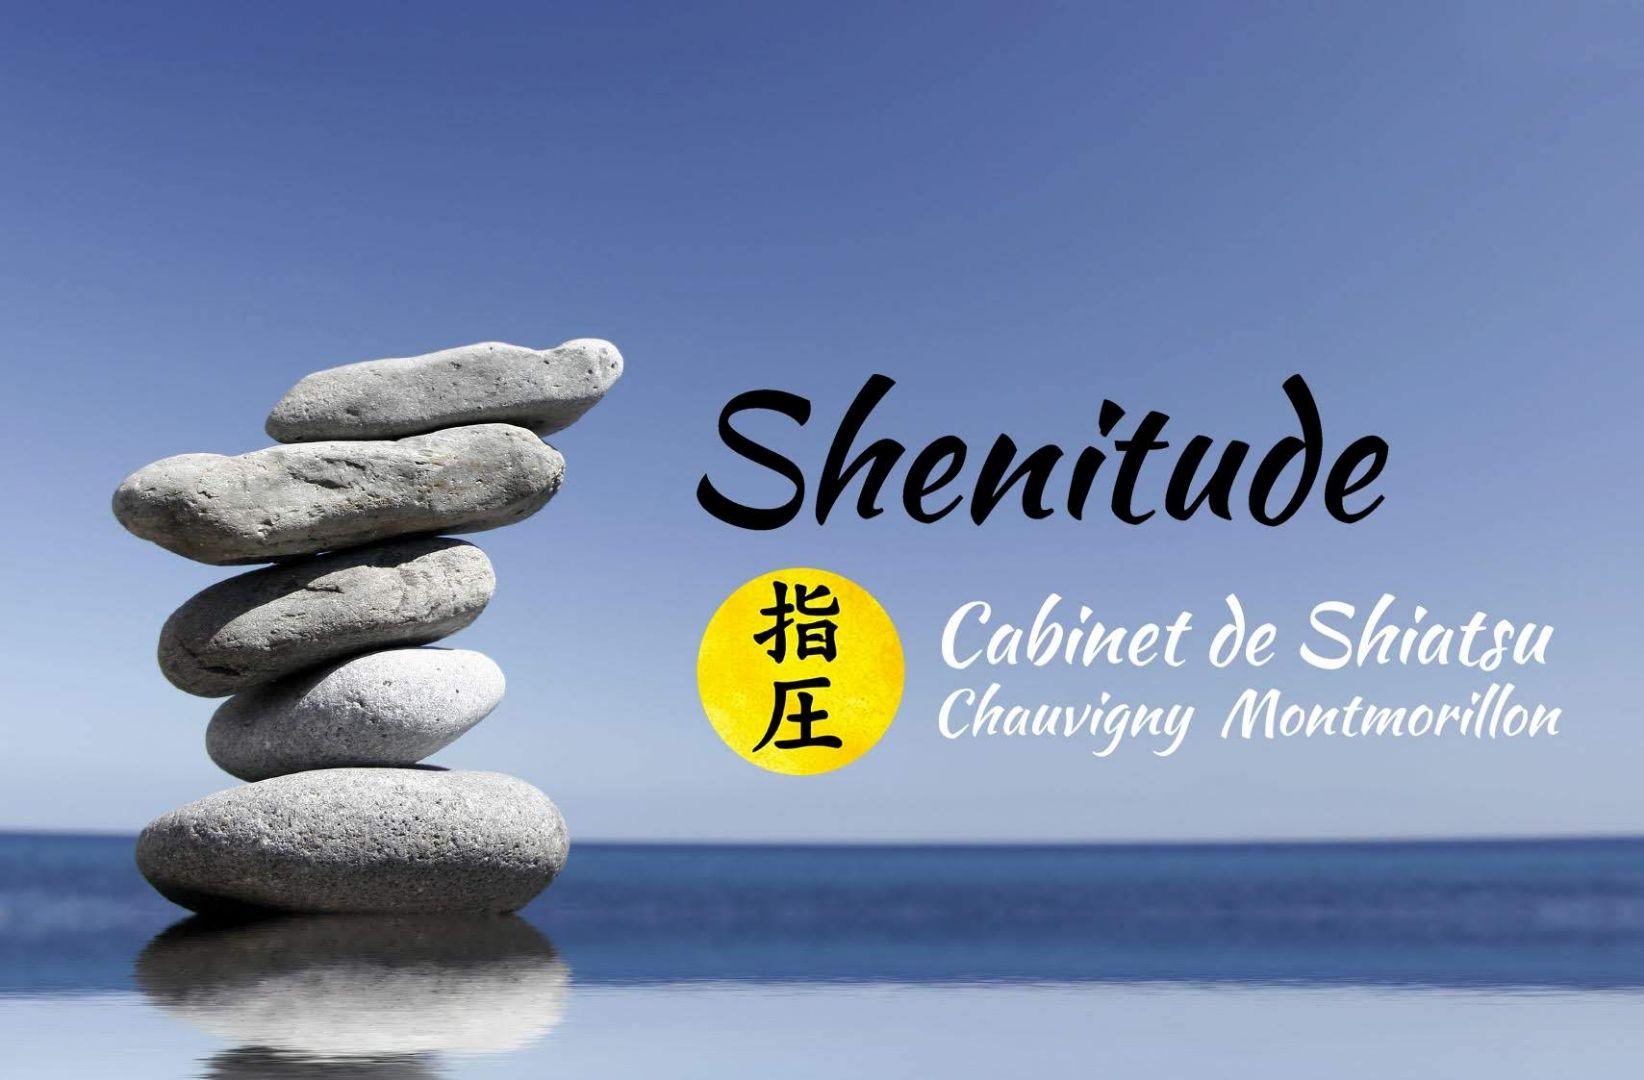 Shenitude : infos, localisation, contacts... pour ce centre de shiatsu